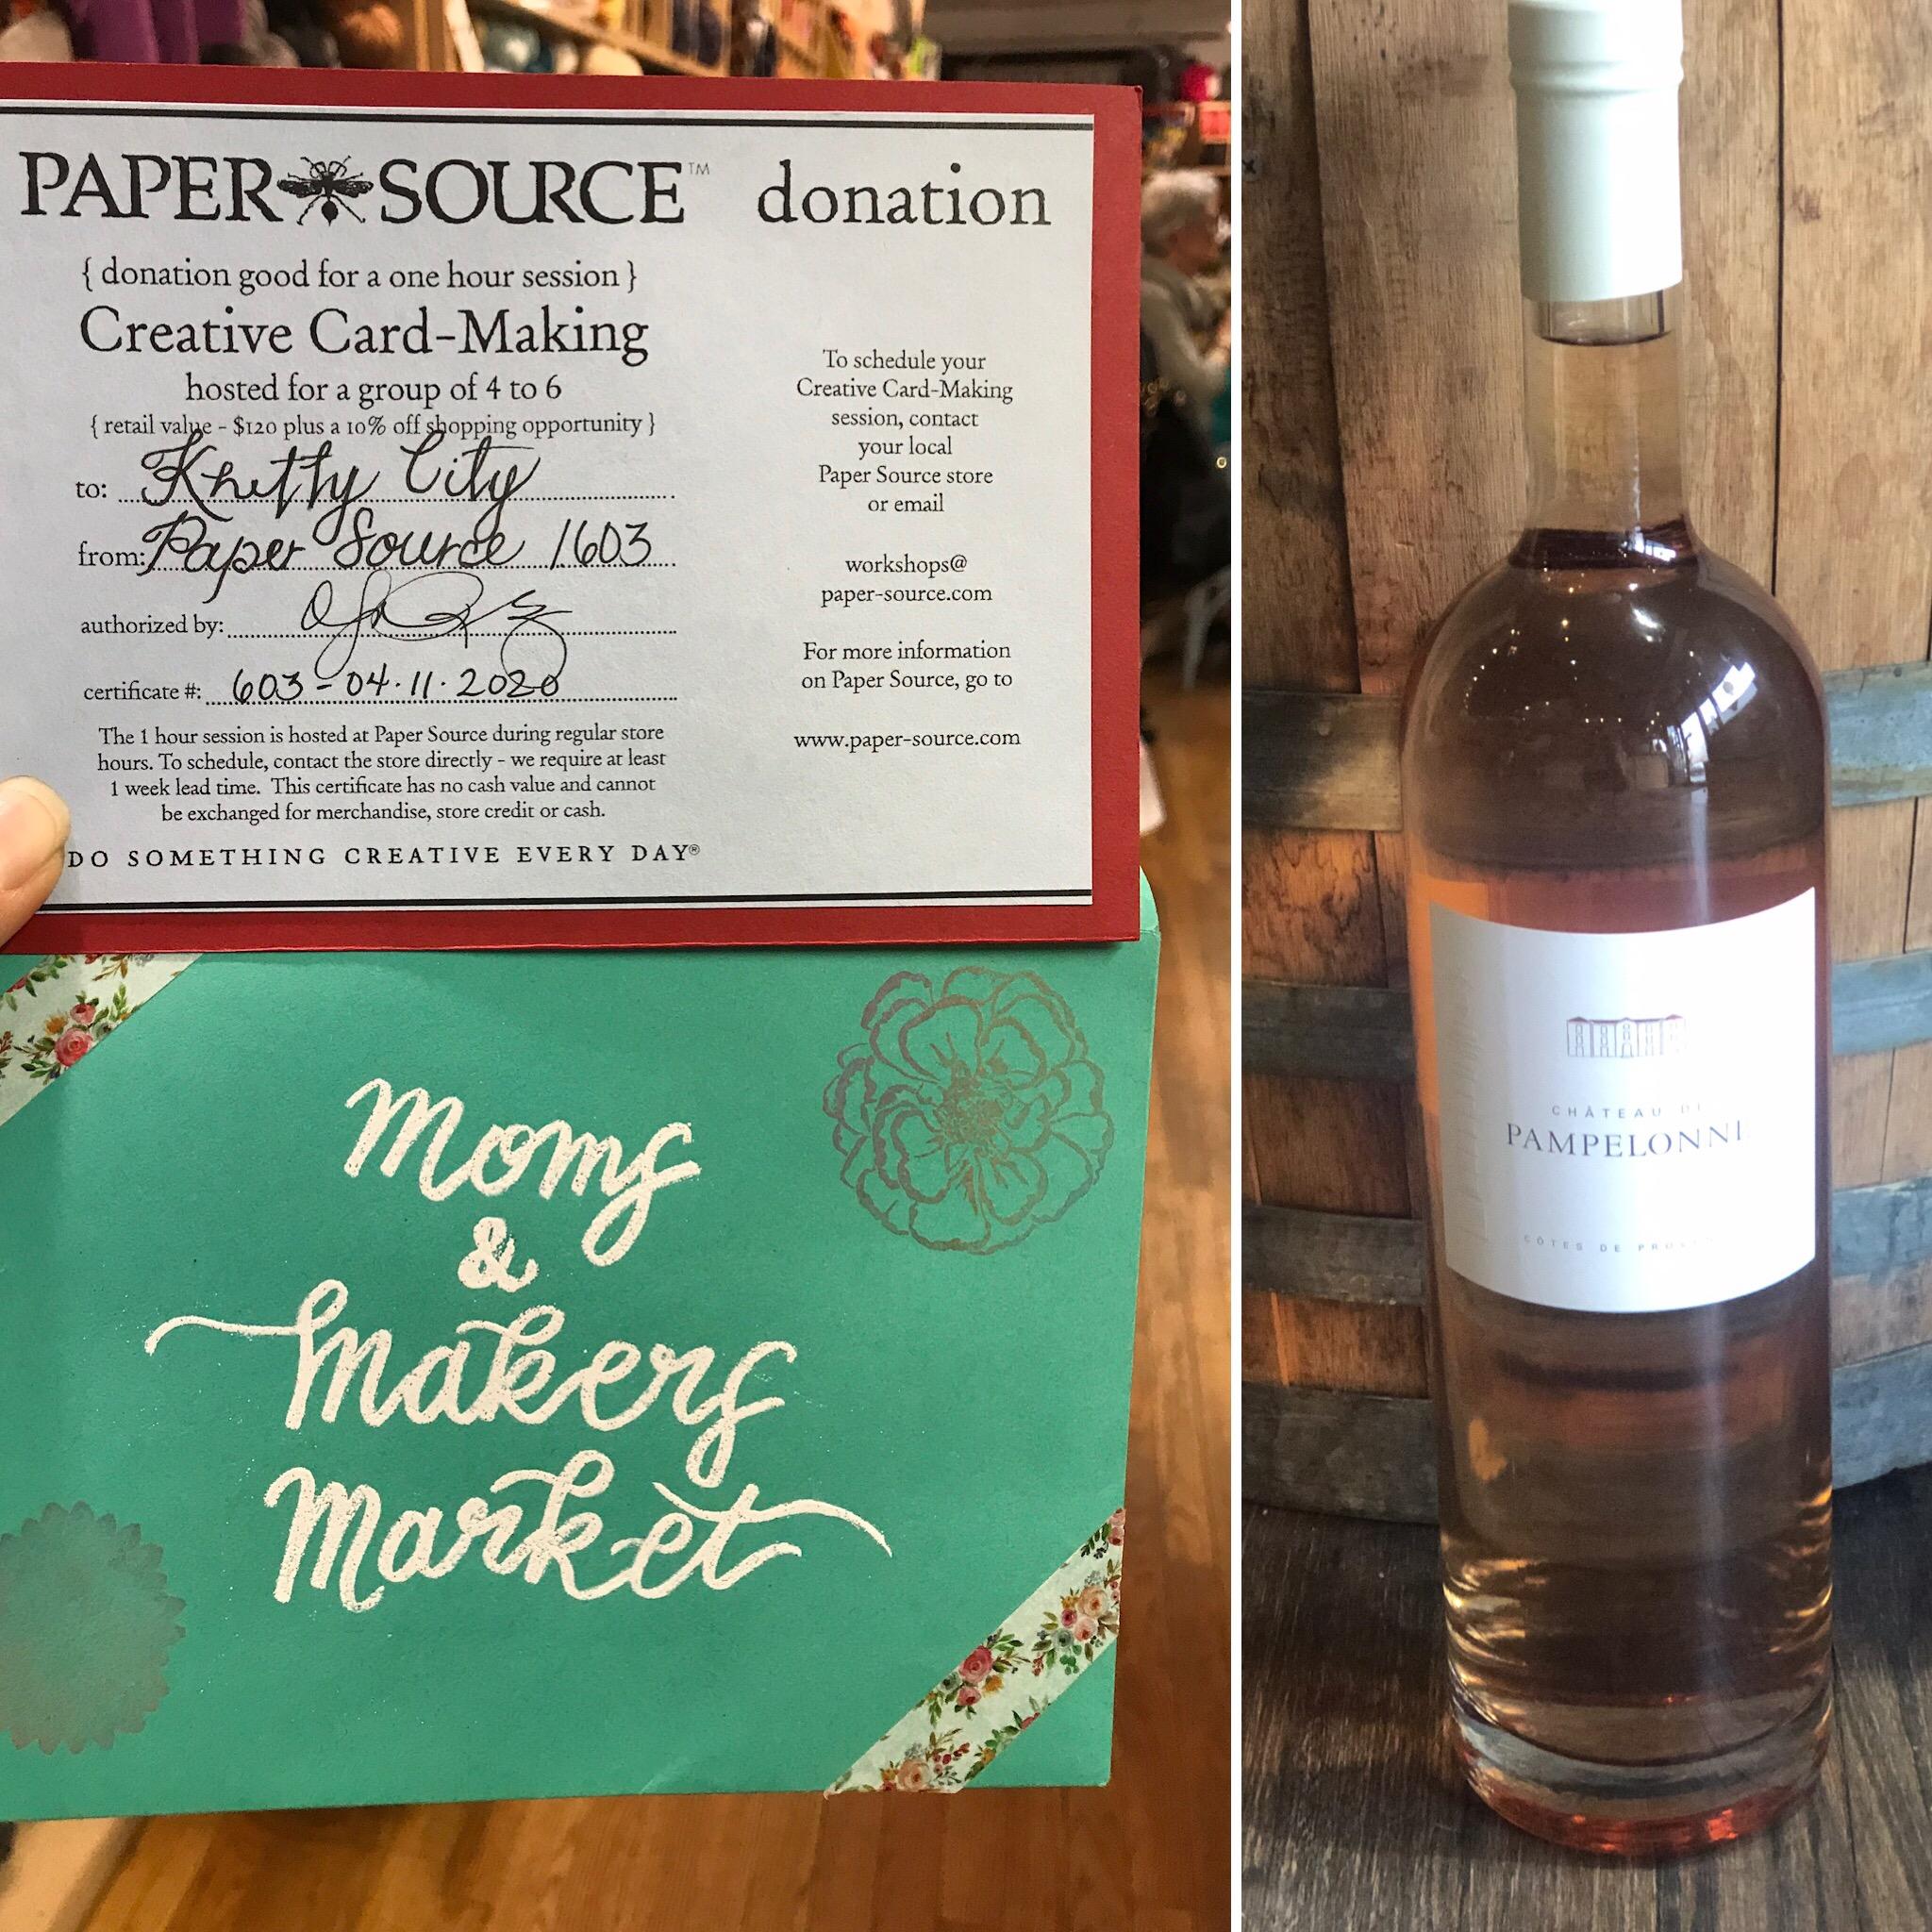 Craft and Sip   Paper Source Card  Making for 6 value $126   West Side Wine  bottle of Rose value $135  Starting Bid $125